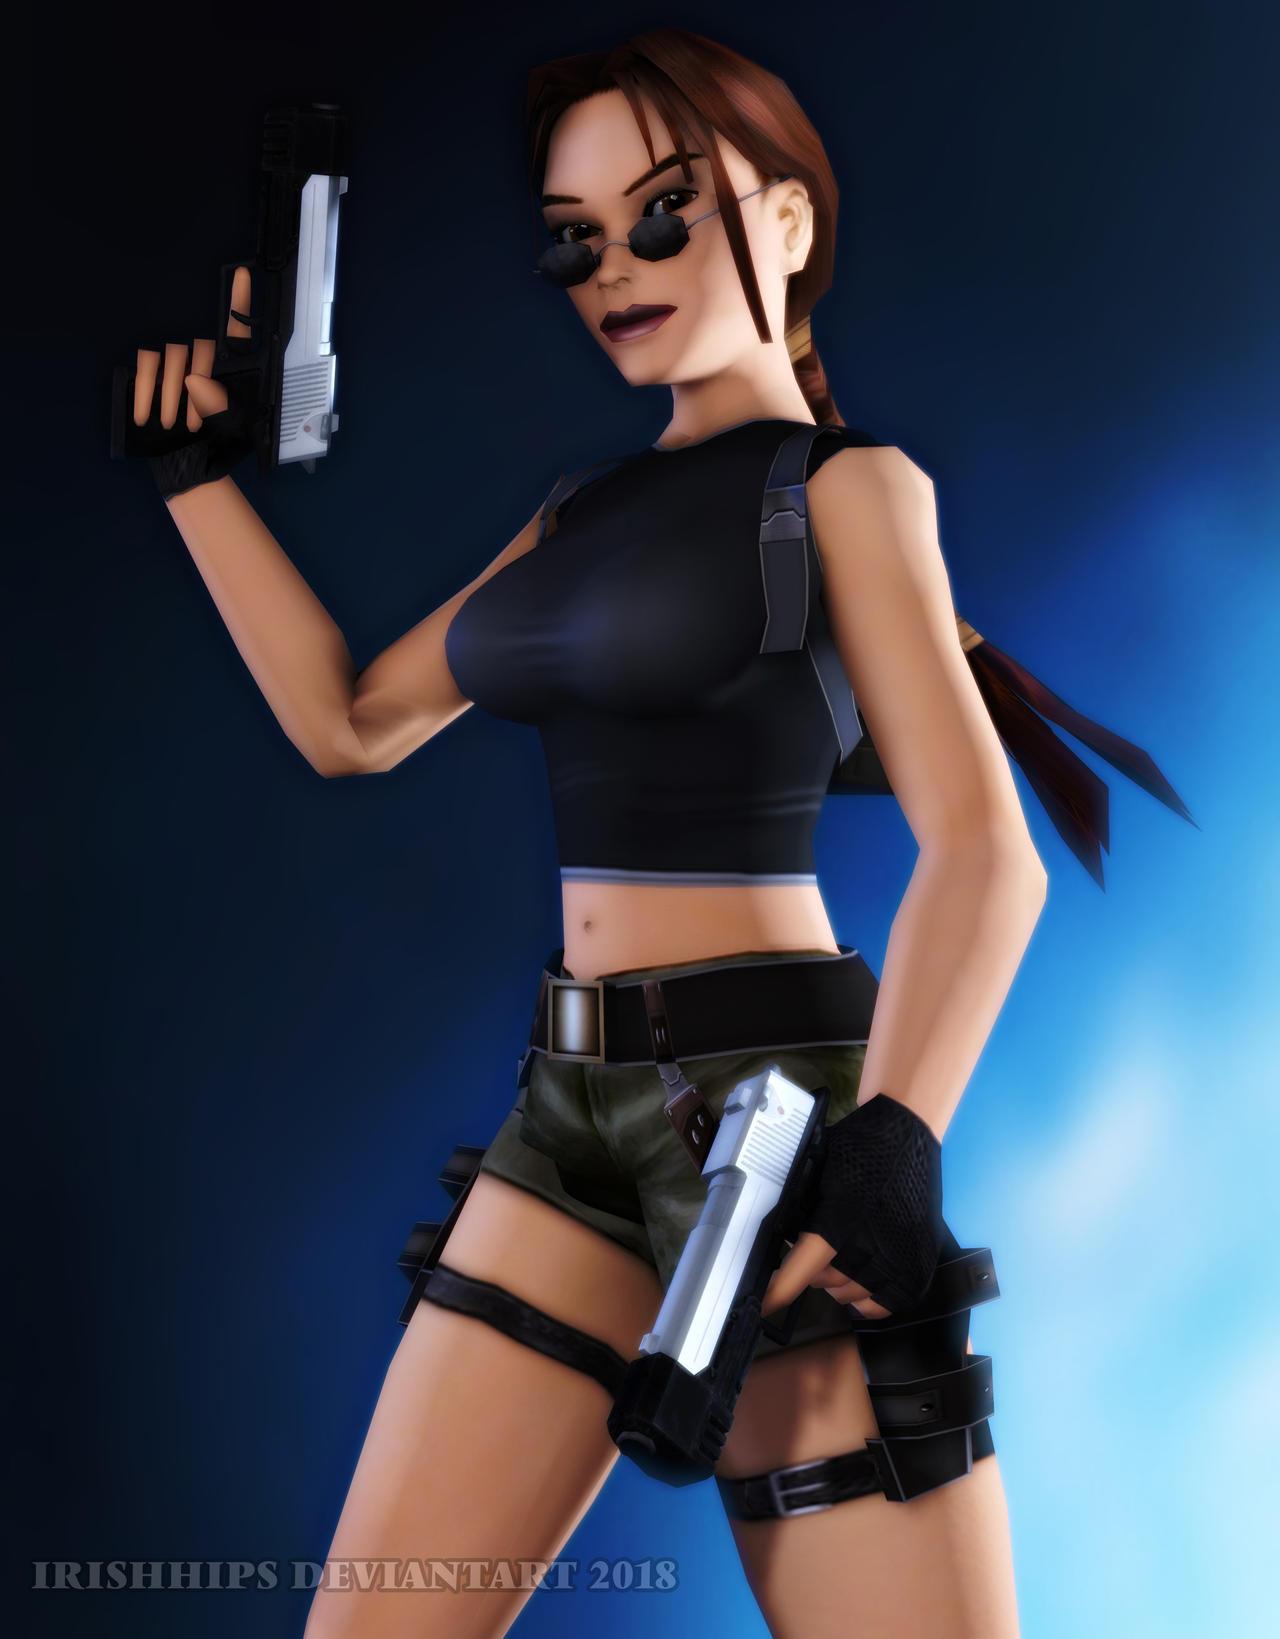 Tomb Raider: Angel Of Darkness - Happy 15th Years! by Irishhips